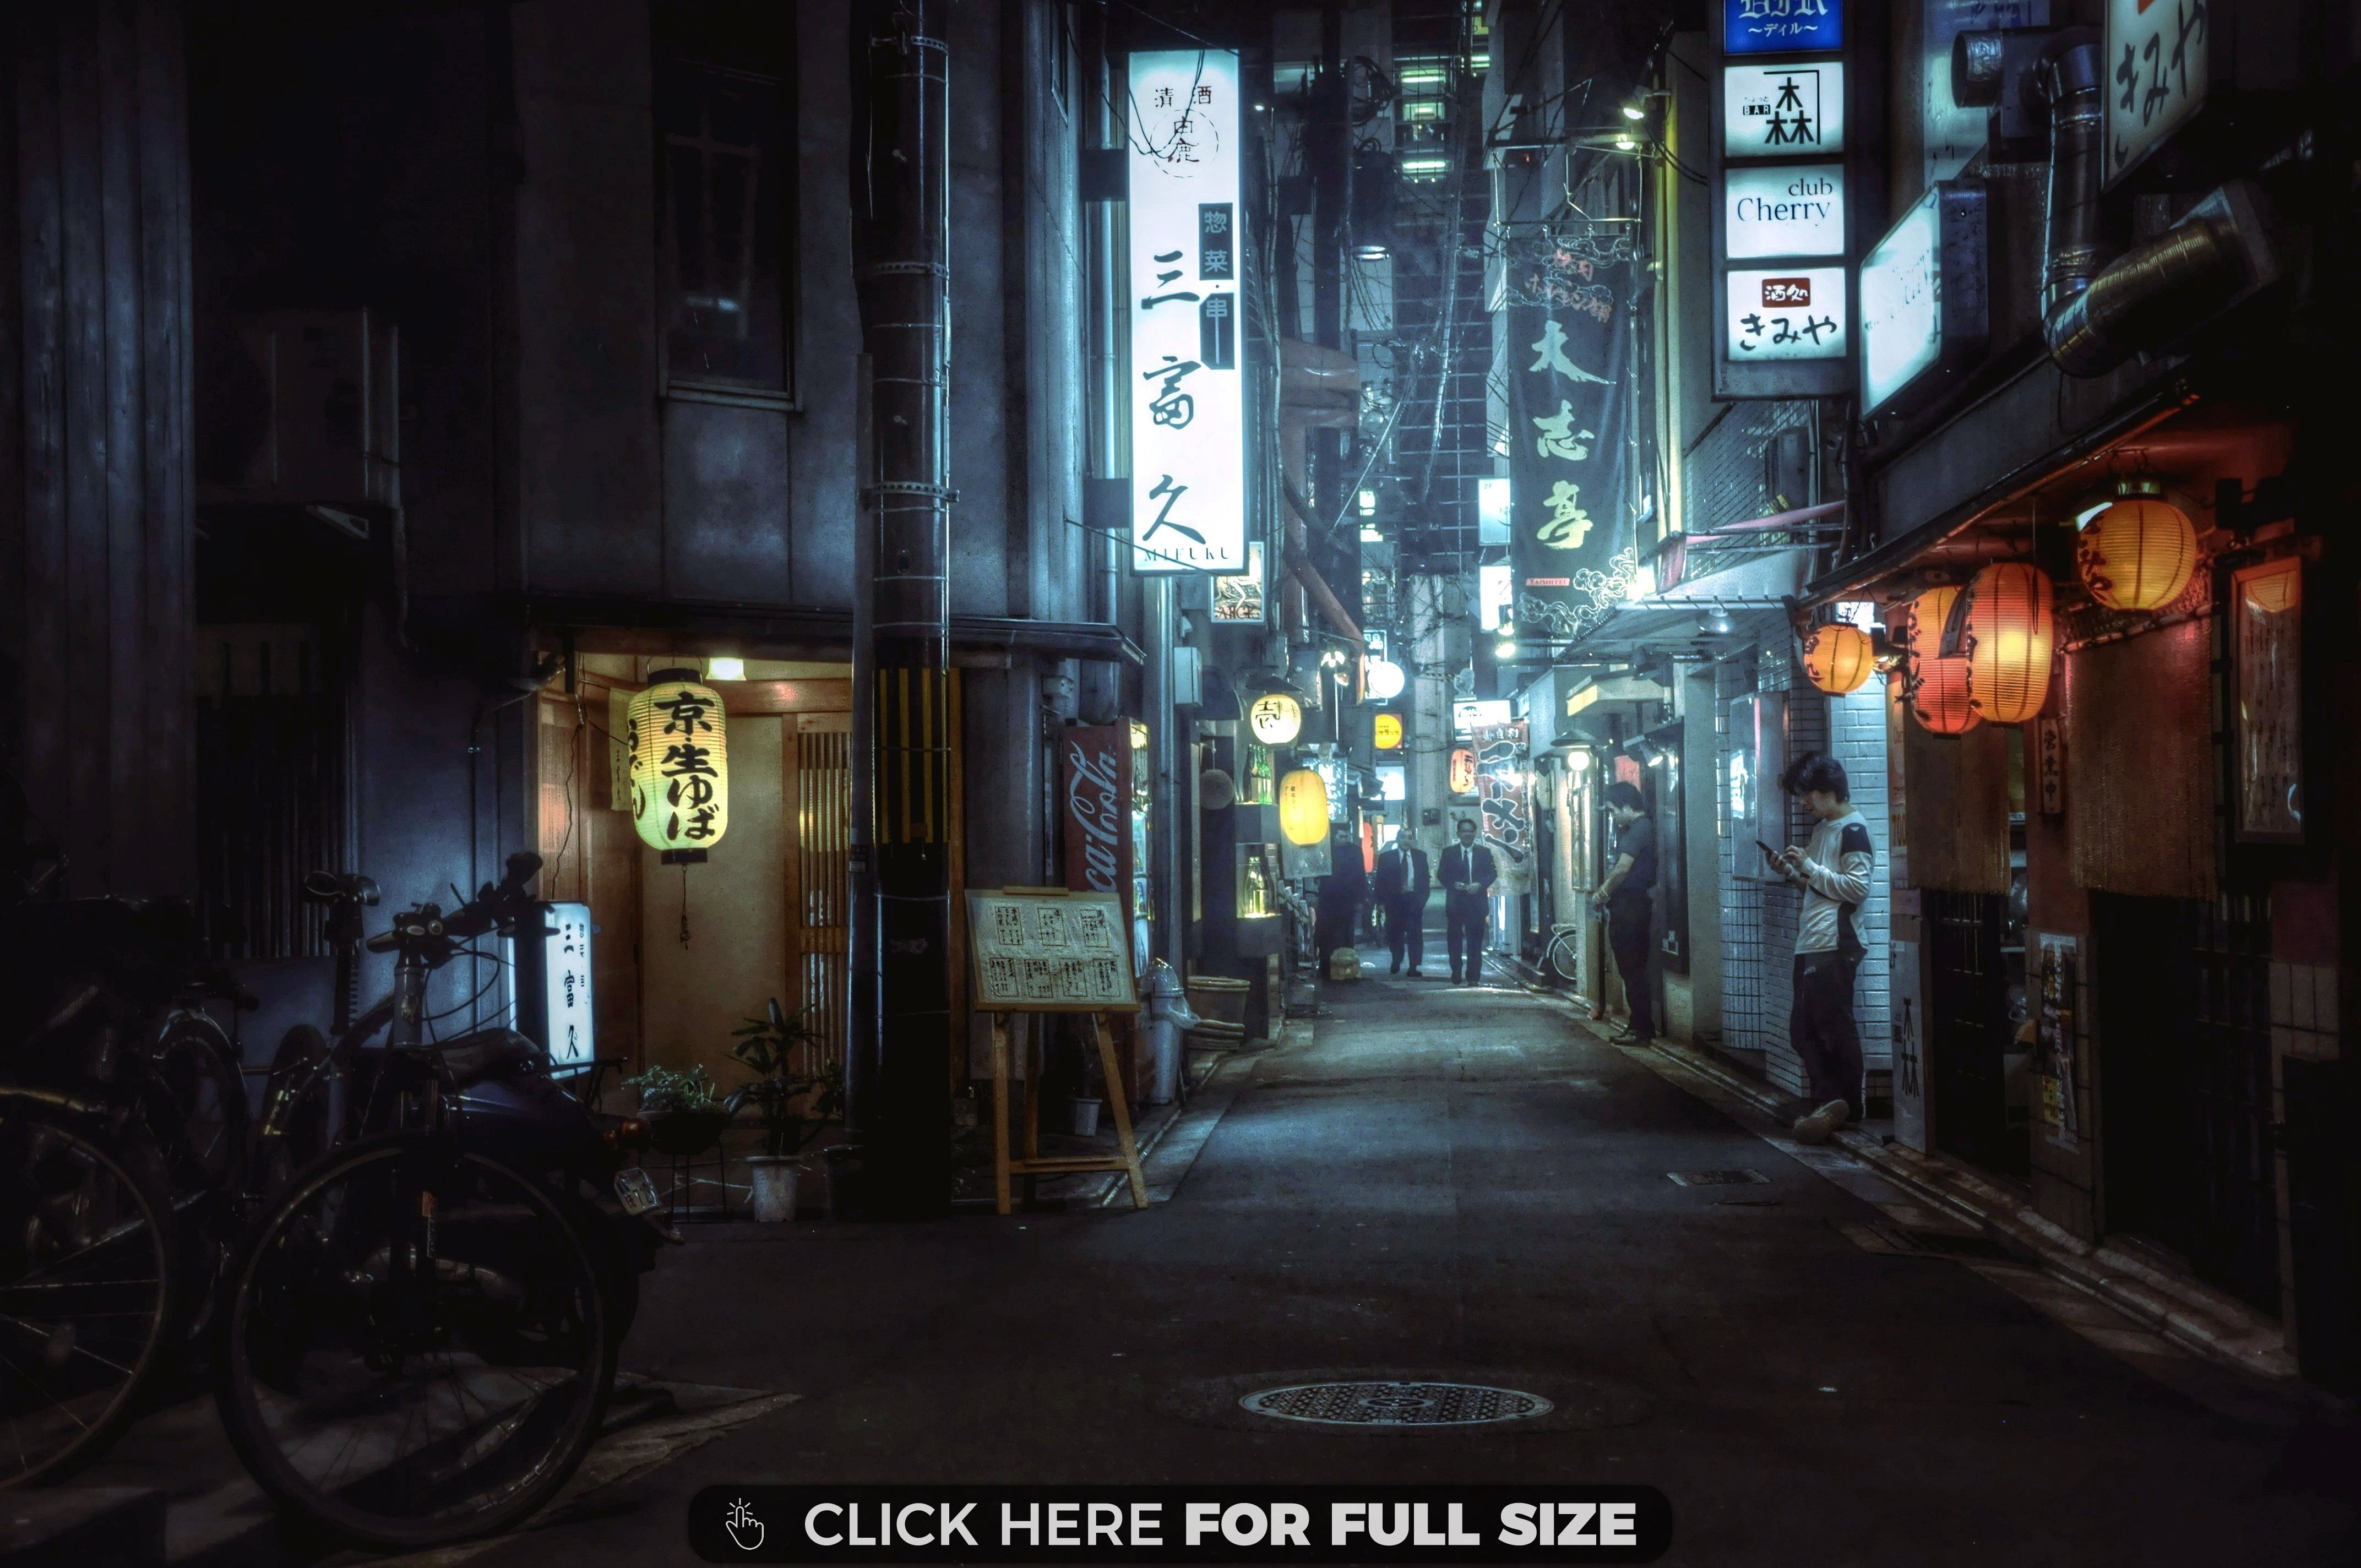 Japanese Alleyway Wallpaper Neon Photography R Wallpaper Alleyway